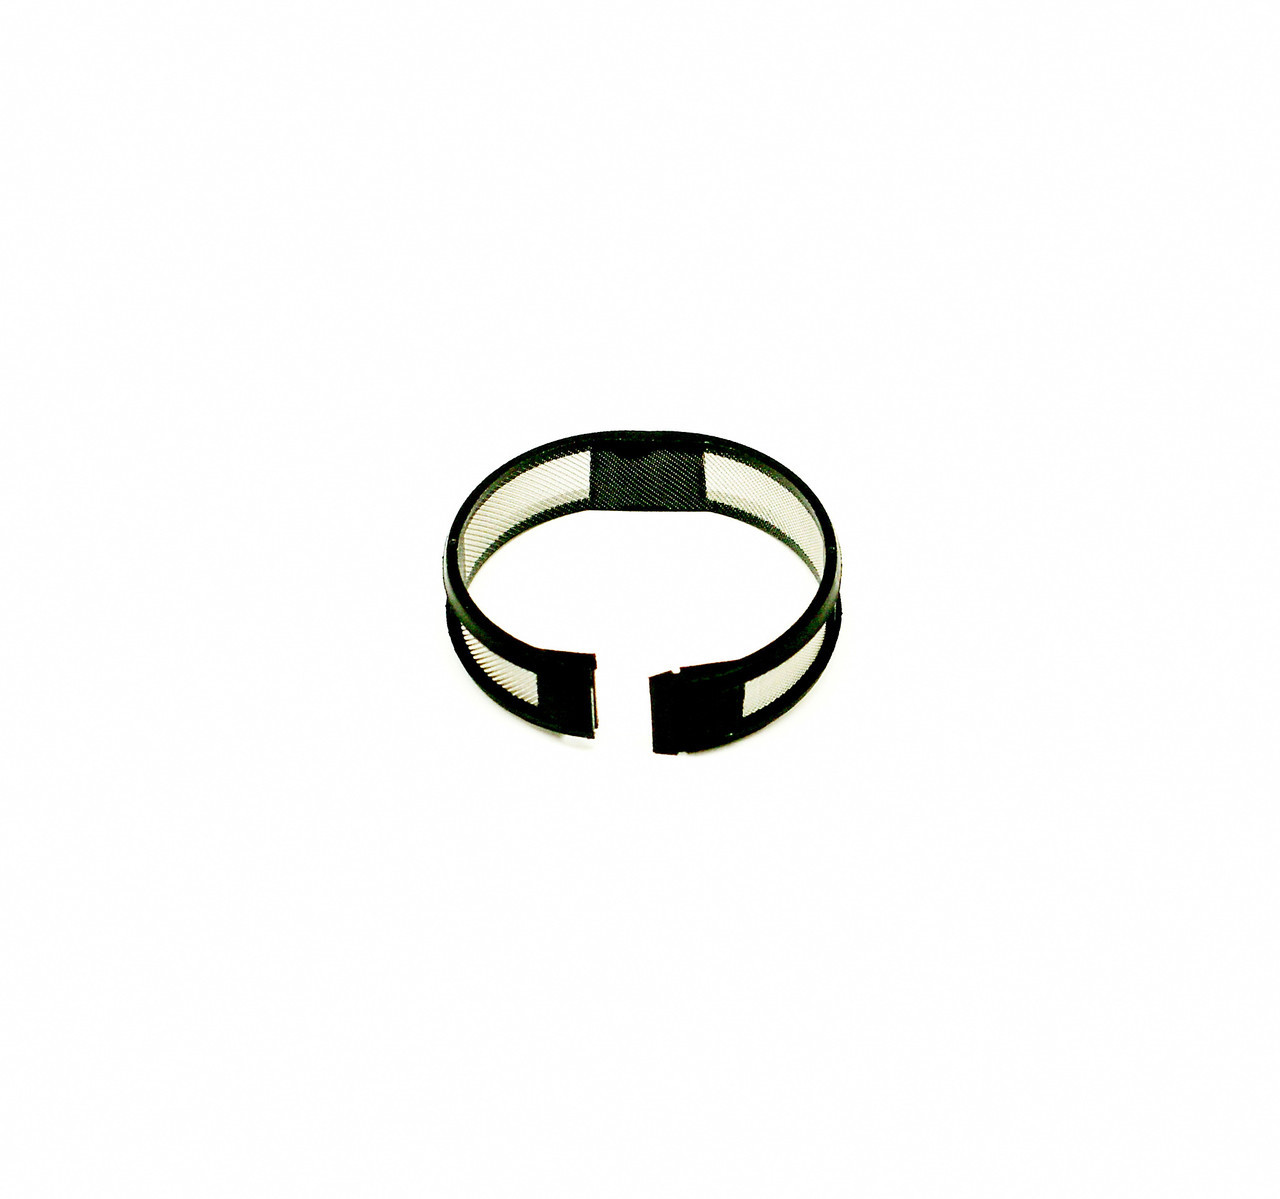 Кольцо сетчатое форсунки Cummins X Series 4009692 1434707